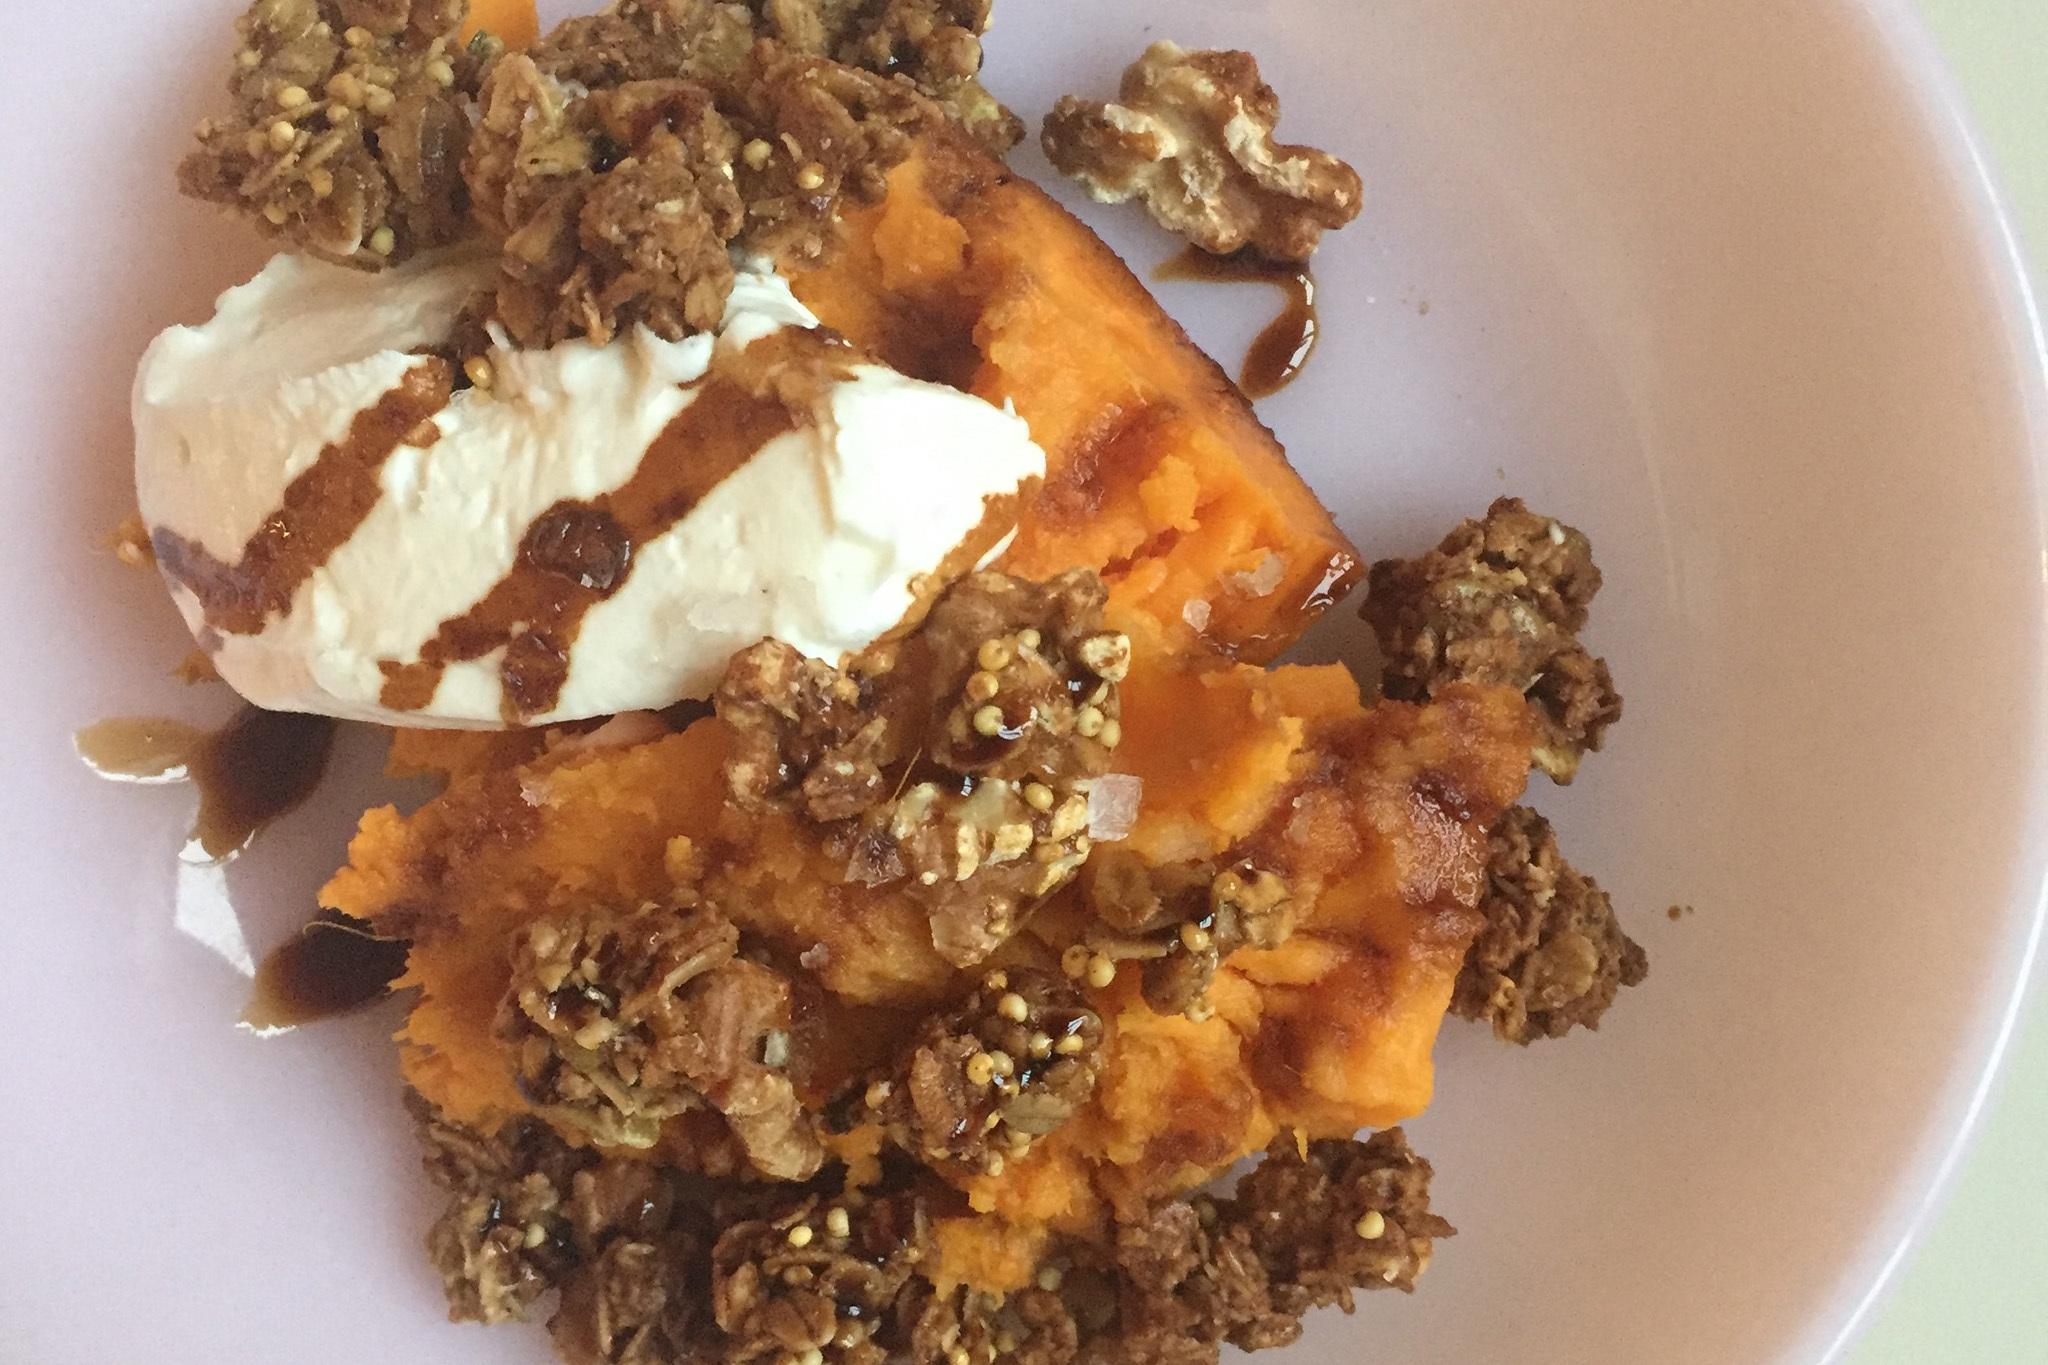 Roasted yam and granola atLalito